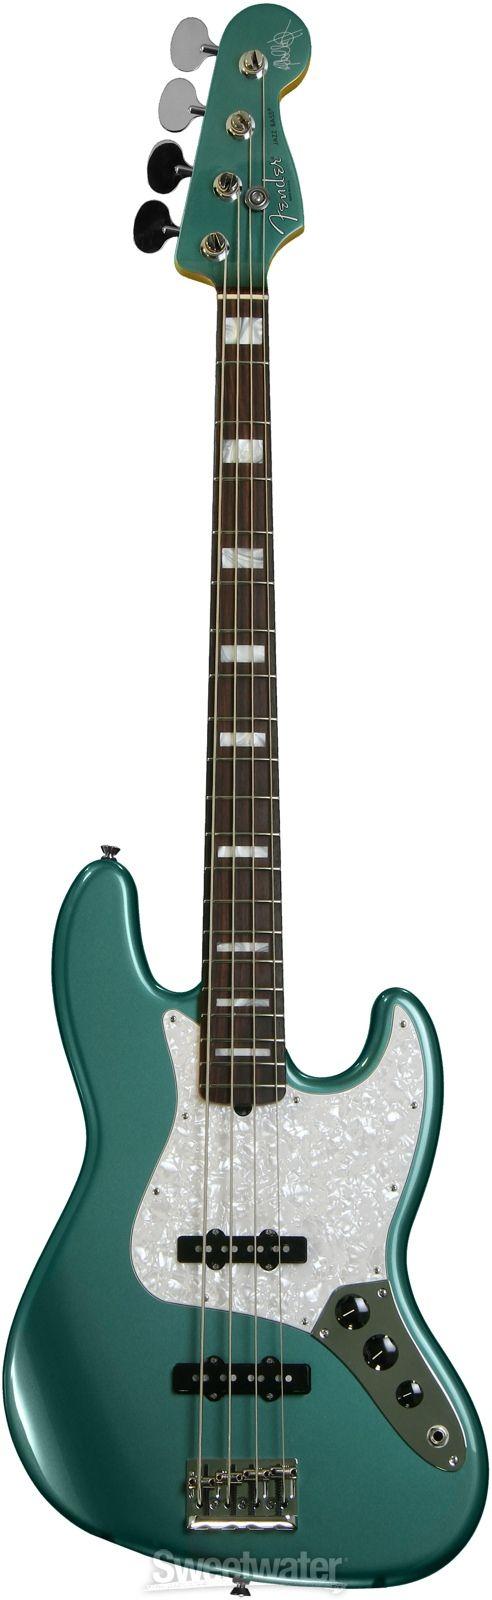 Fender Adam Clayton Jazz Bass - Sherwood Green Metallic   Sweetwater.com